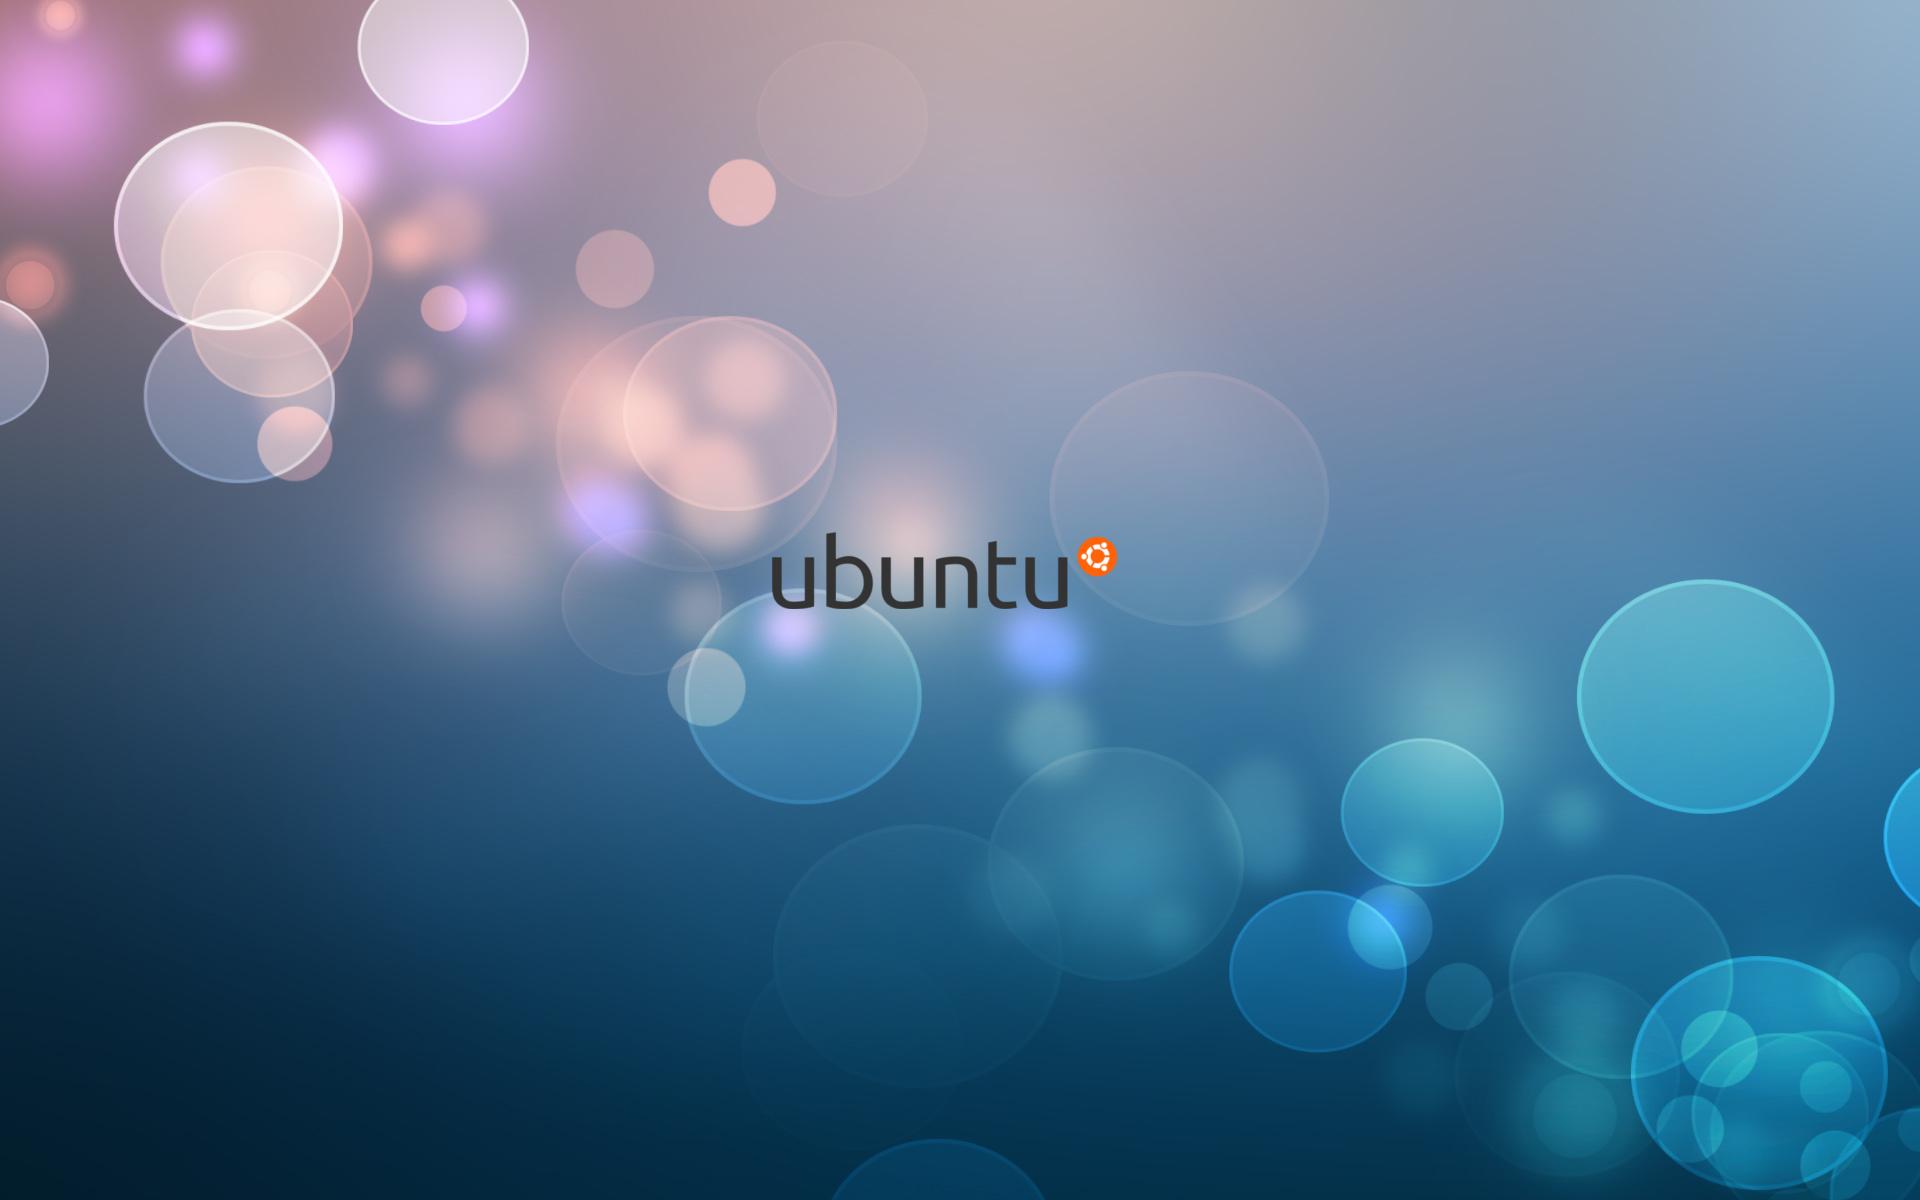 ubuntu esperance 2 by shiloh09 d300hjc 82x82 Wallpapers Ubuntu 1920x1200